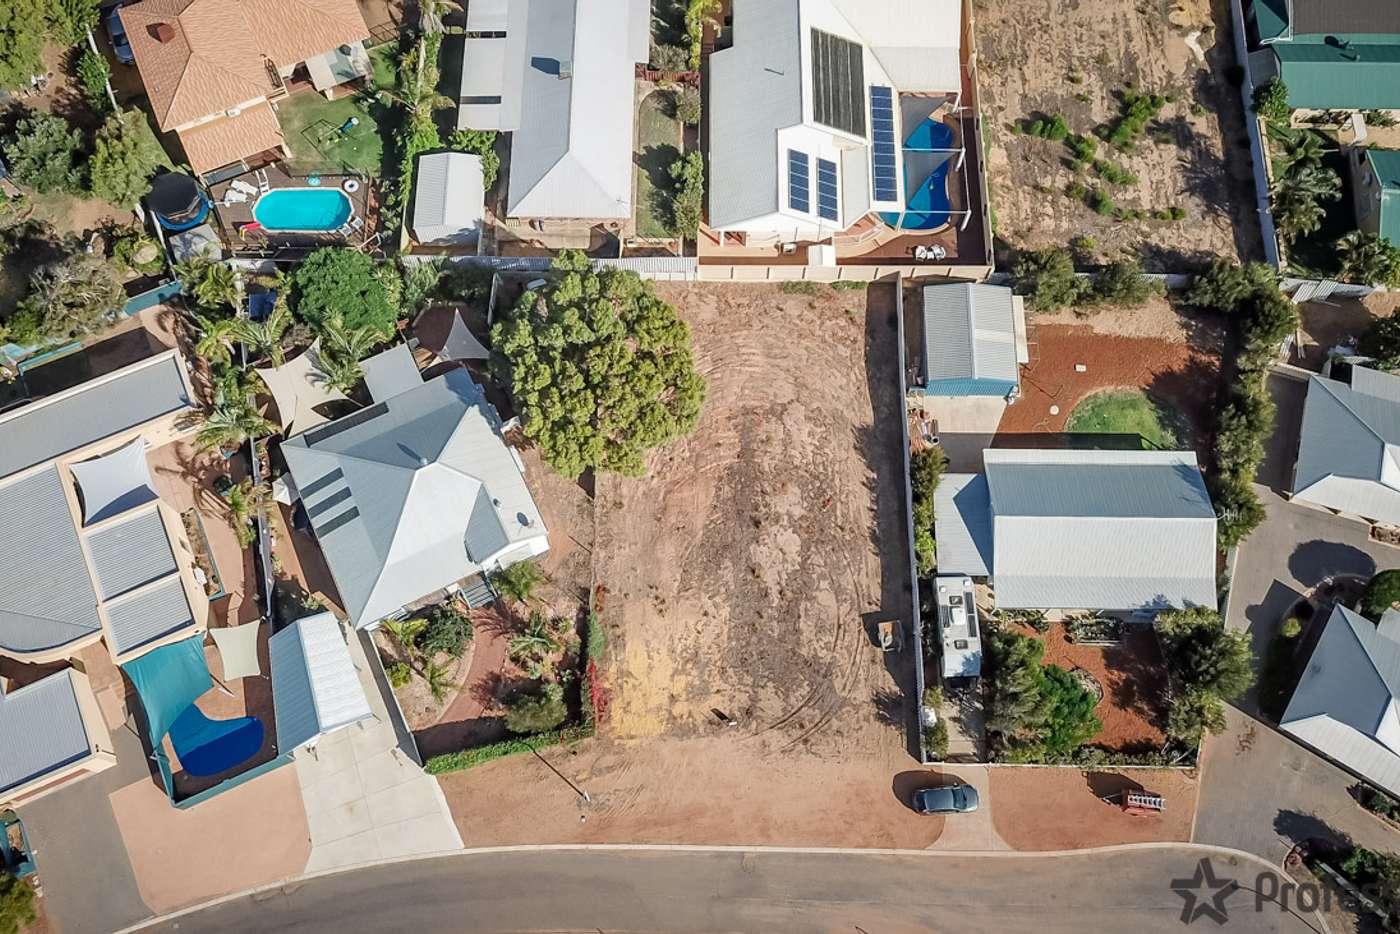 Main view of Homely residentialLand listing, 7 Seakist Retreat, Kalbarri WA 6536